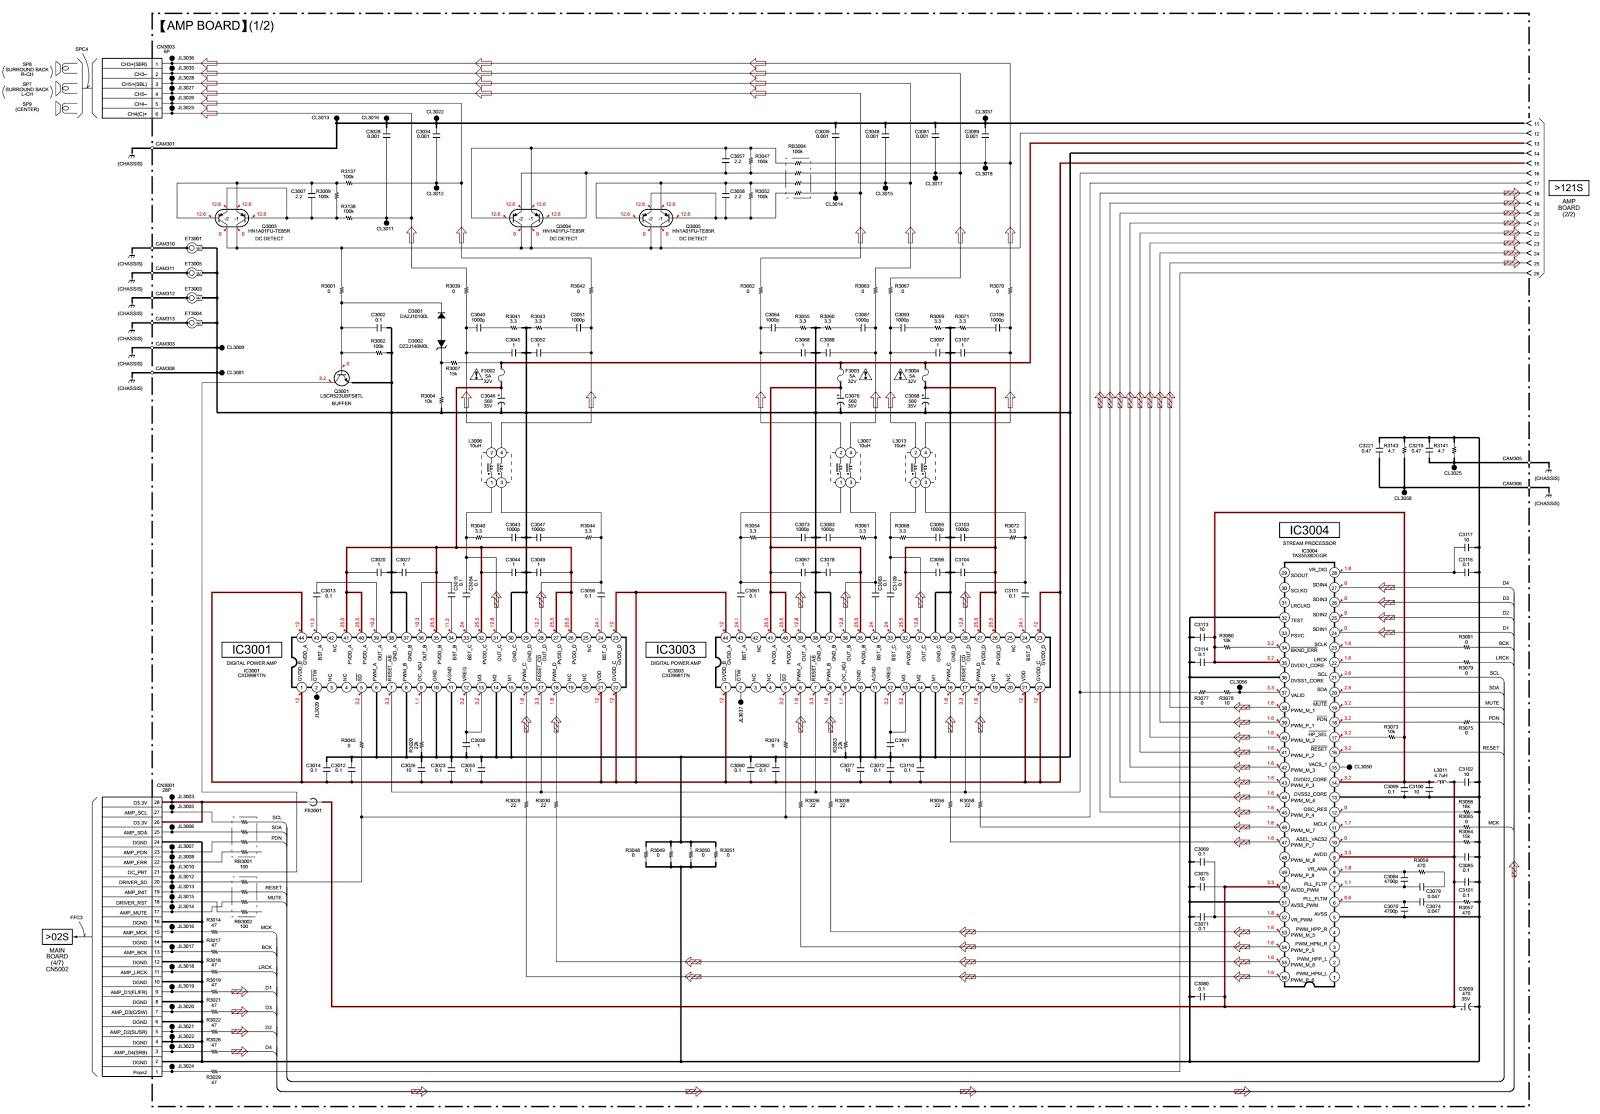 1988 Ford F 150 Wiring Diagram Trailer Salerno Diagrams